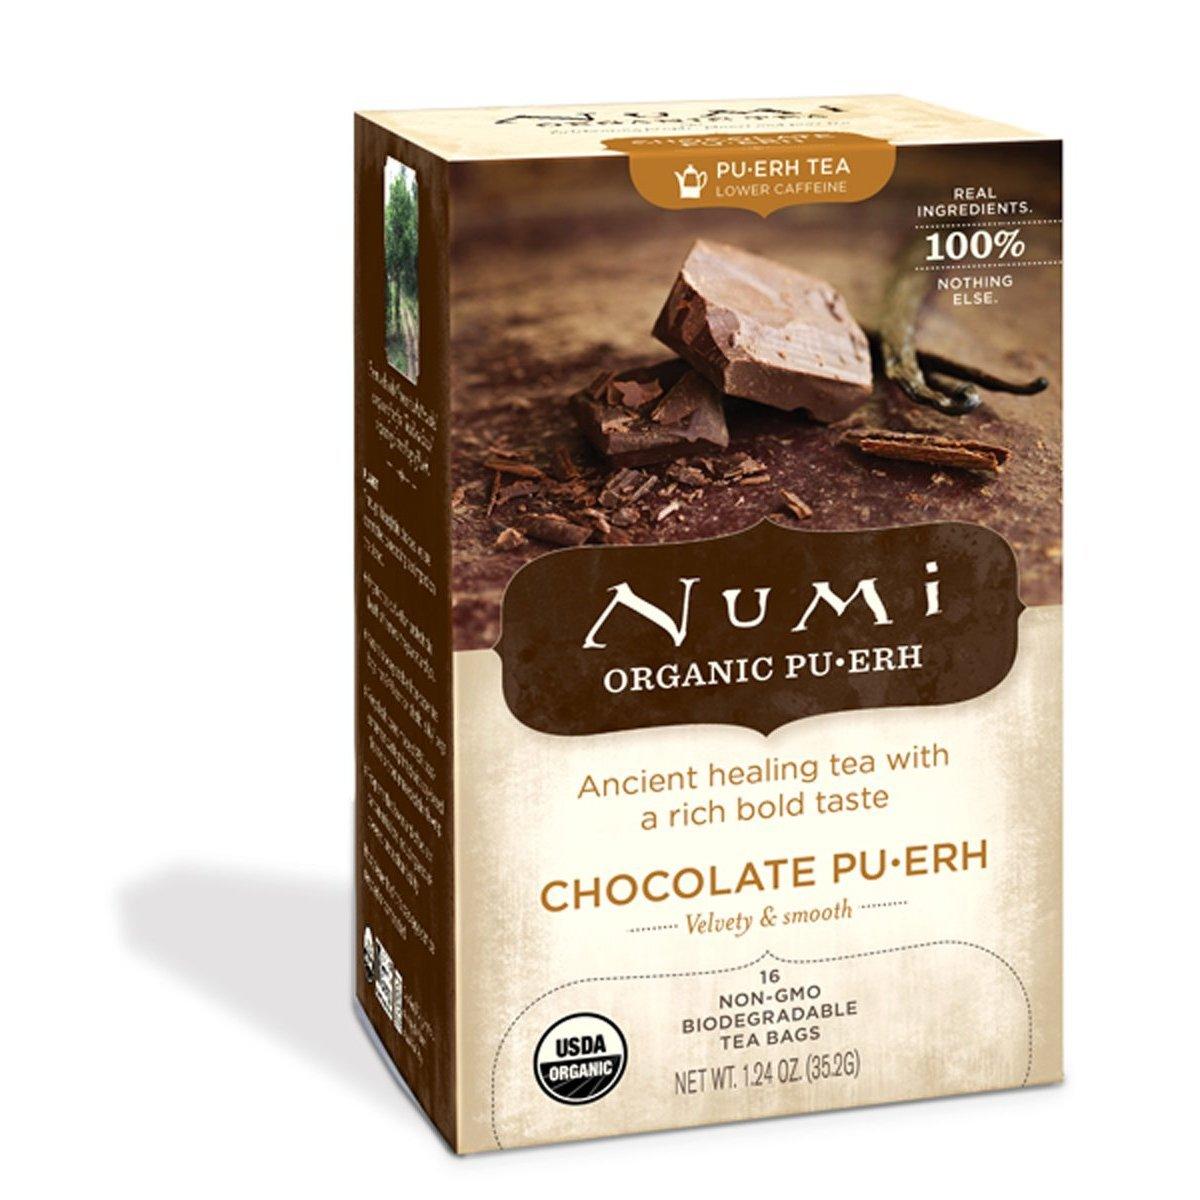 NUMI - Pu Erh con Chocolate - Aterciopelado e Irresistible ...